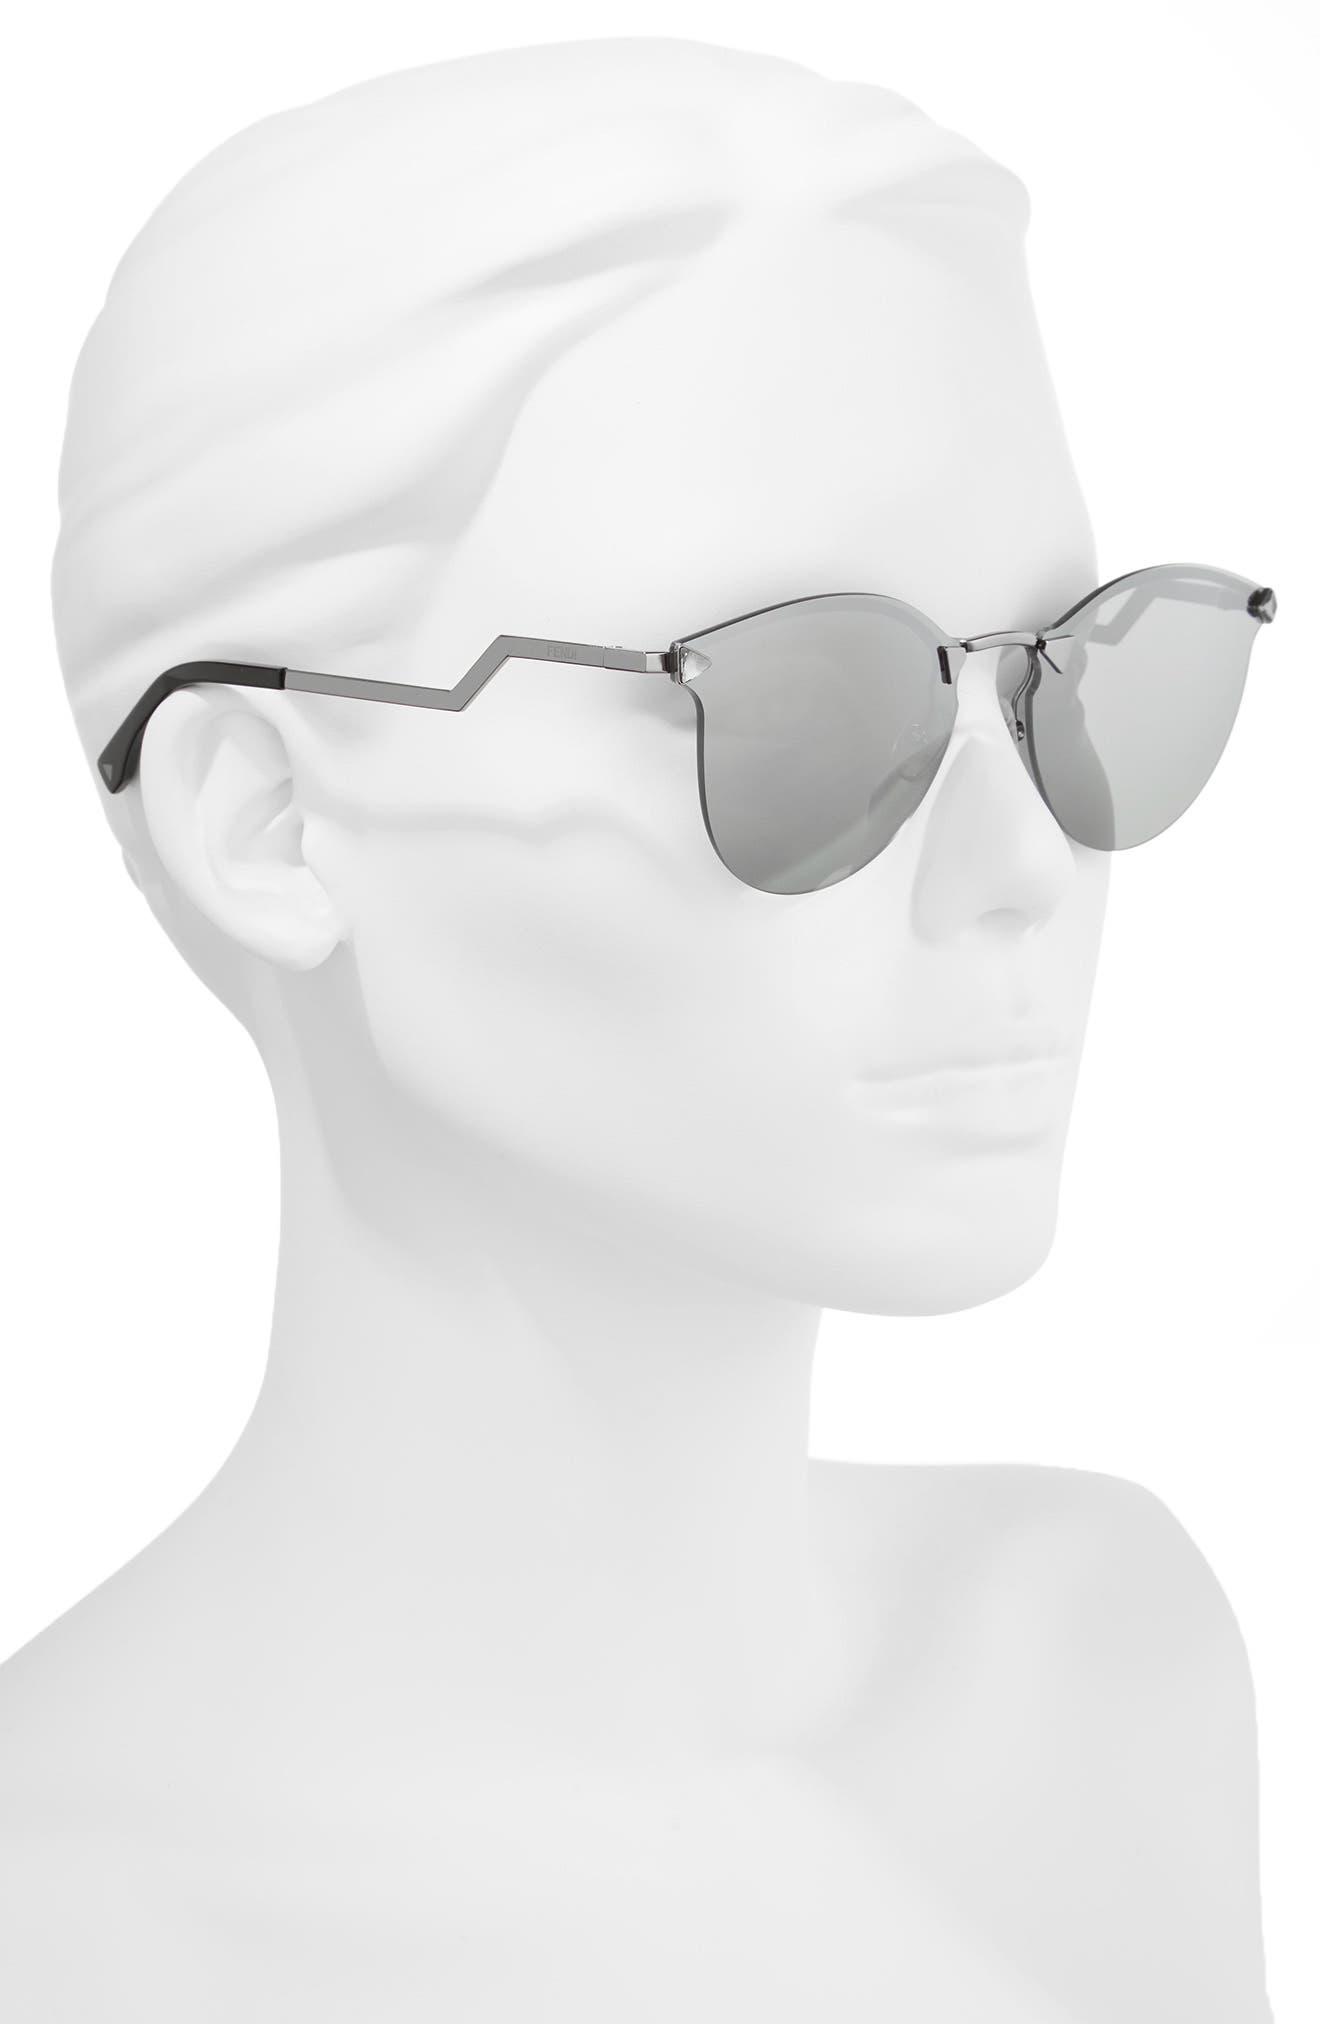 60mm Retro Sunglasses,                             Alternate thumbnail 2, color,                             045